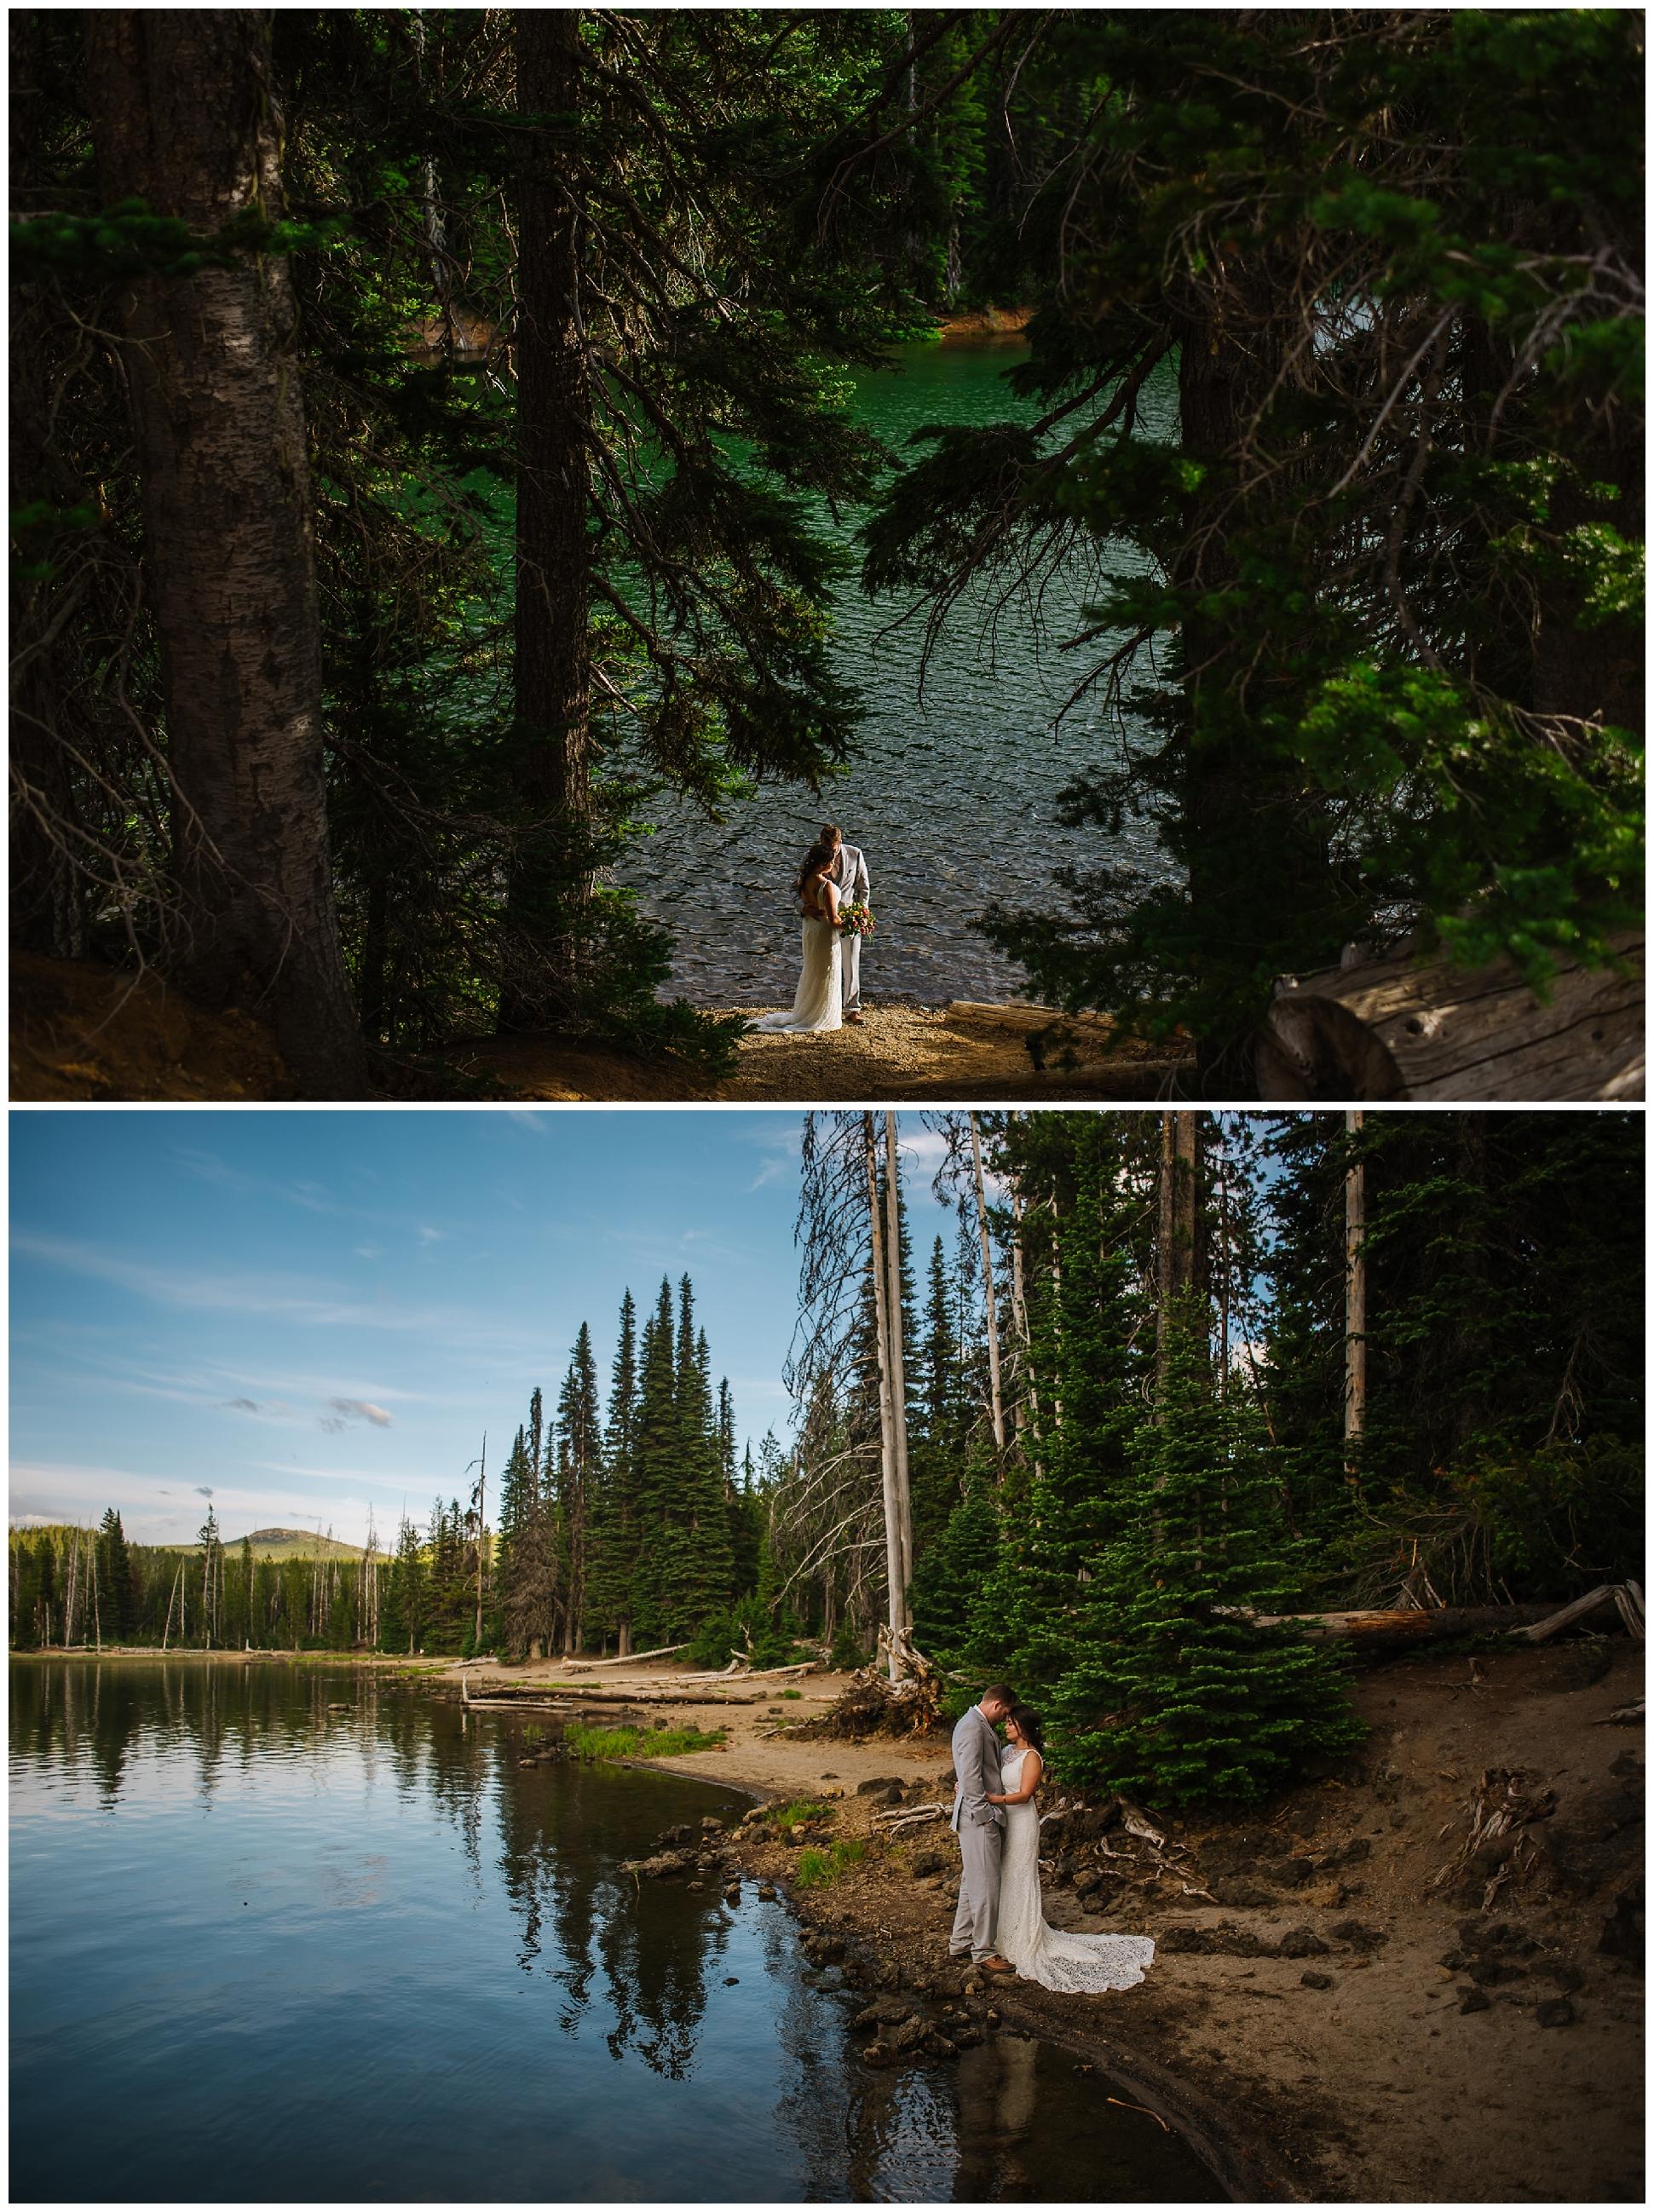 Ashlee-hamon-photography-year-in-review-2016-travel-wanderlust-vsco-adventure-wedding_0053.jpg